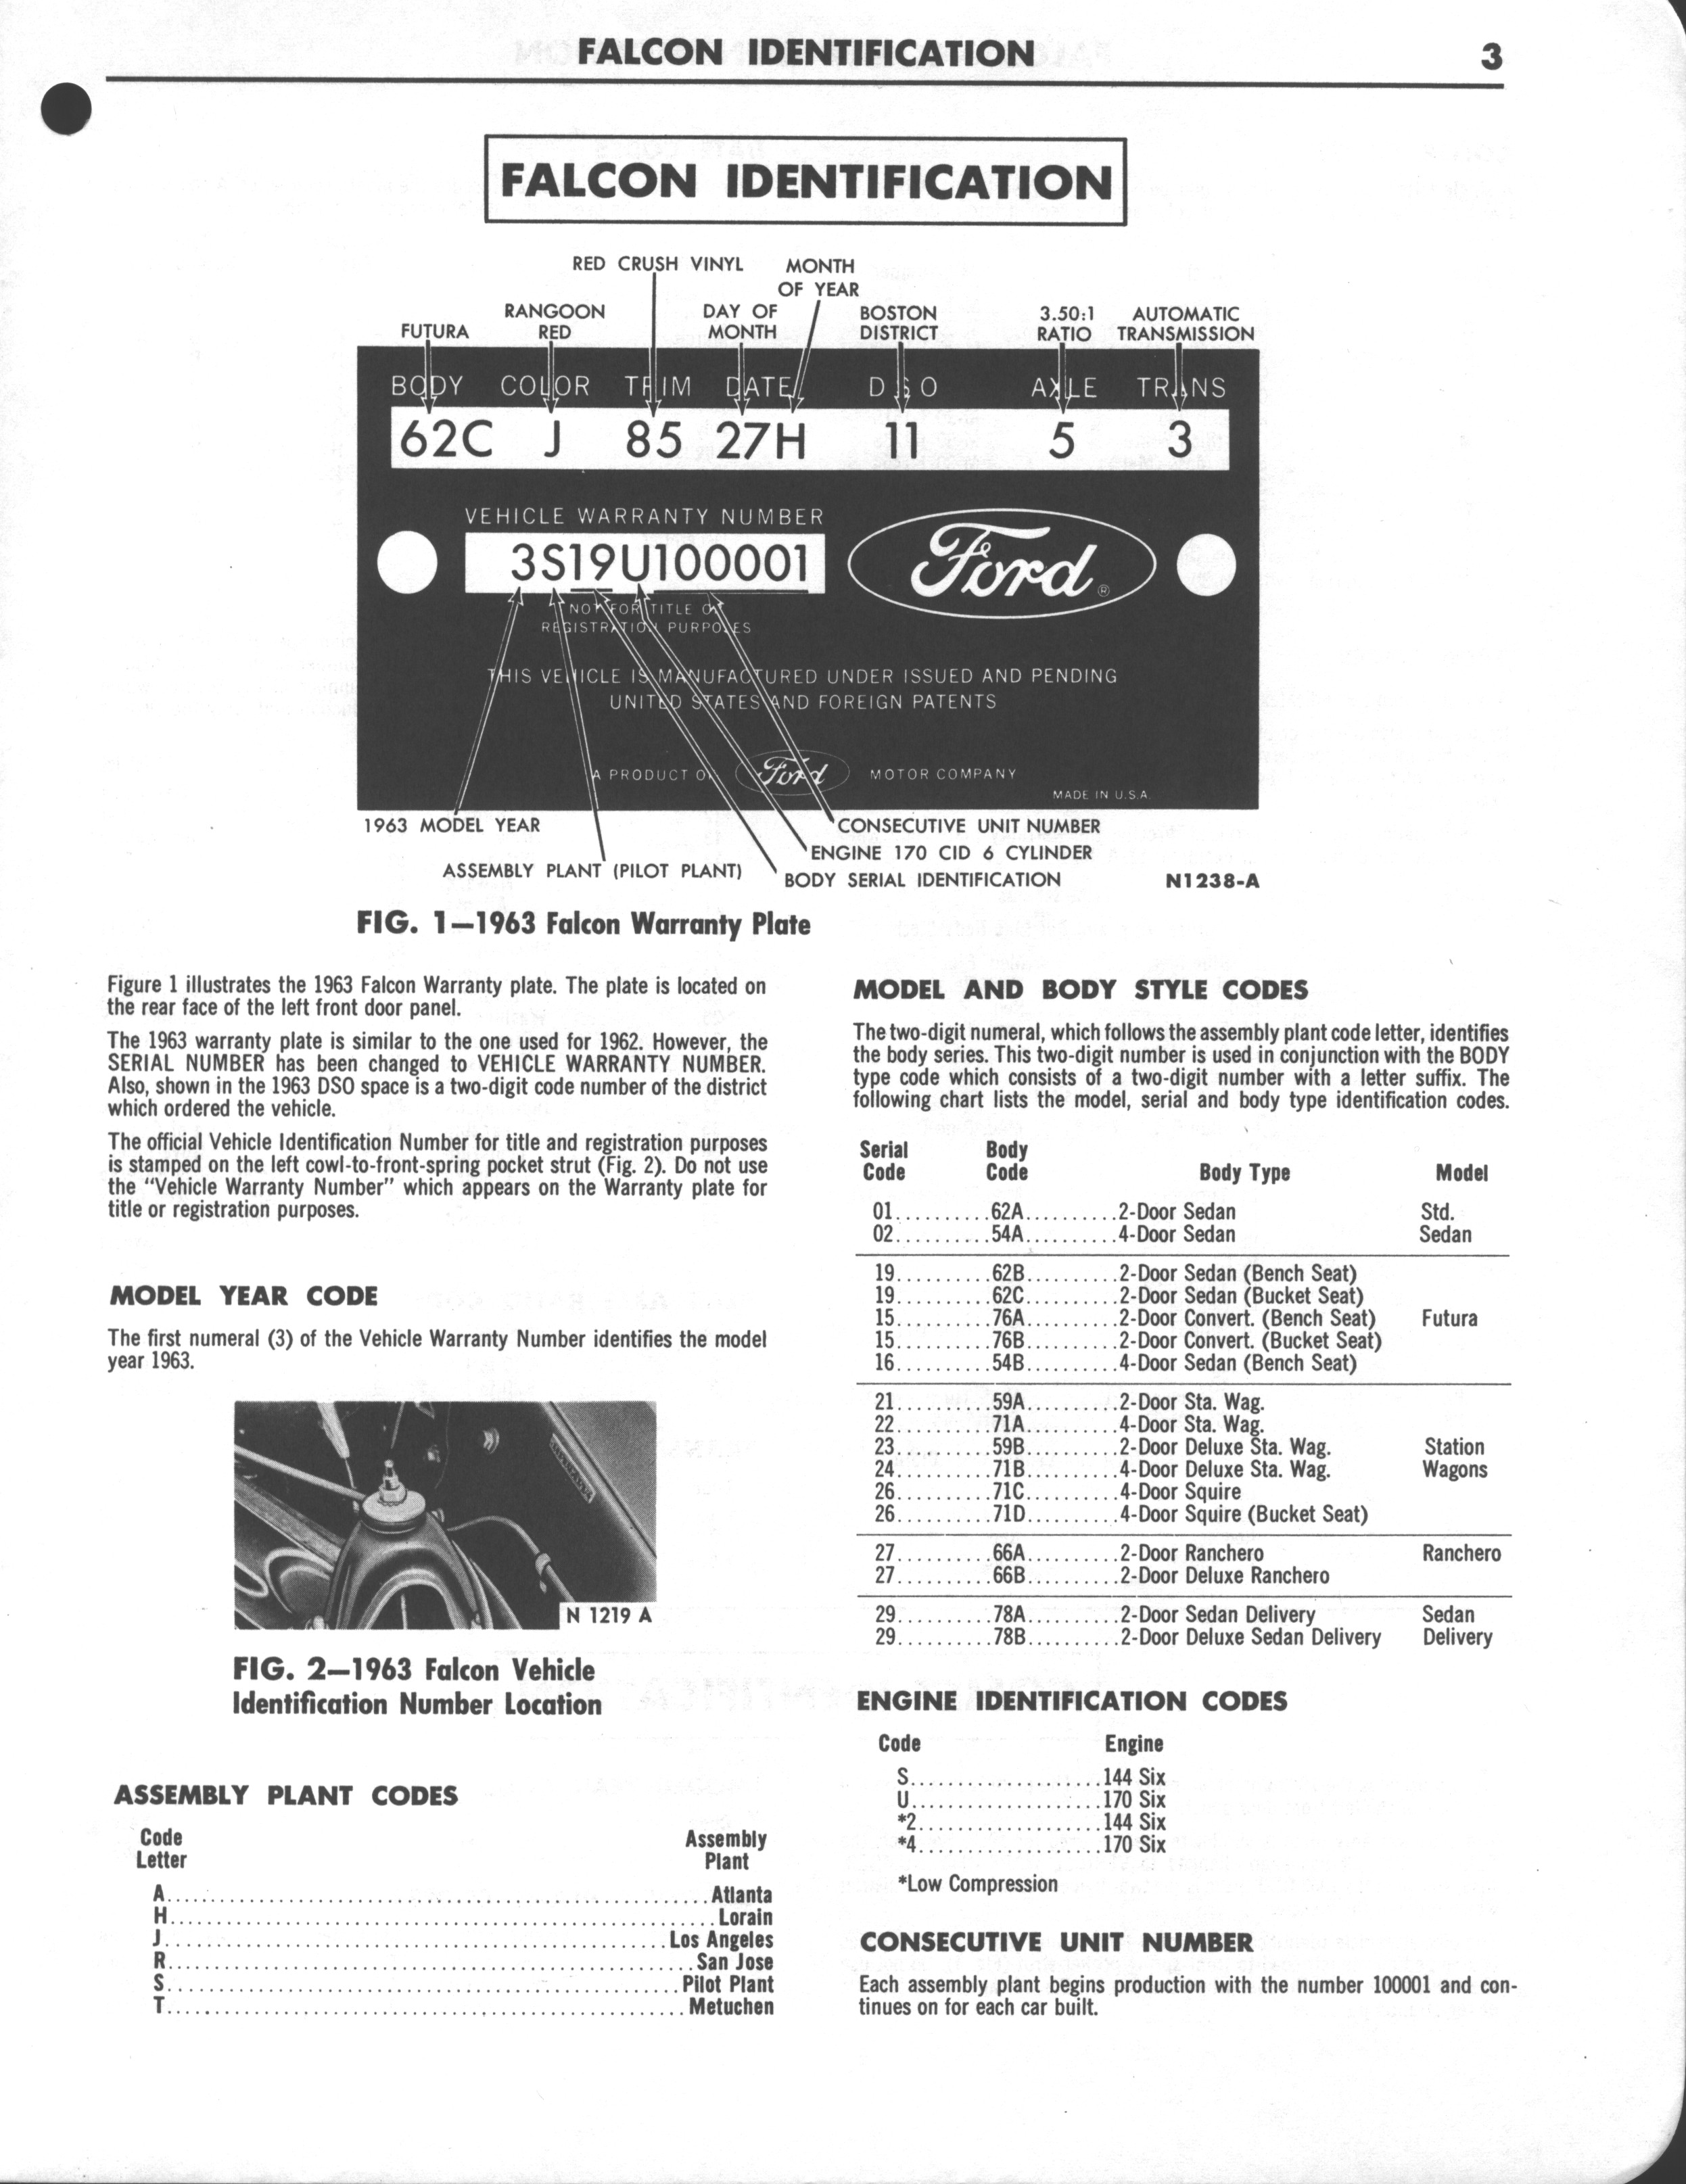 Falcon Shop Manual Supplement, 1963: Page 3